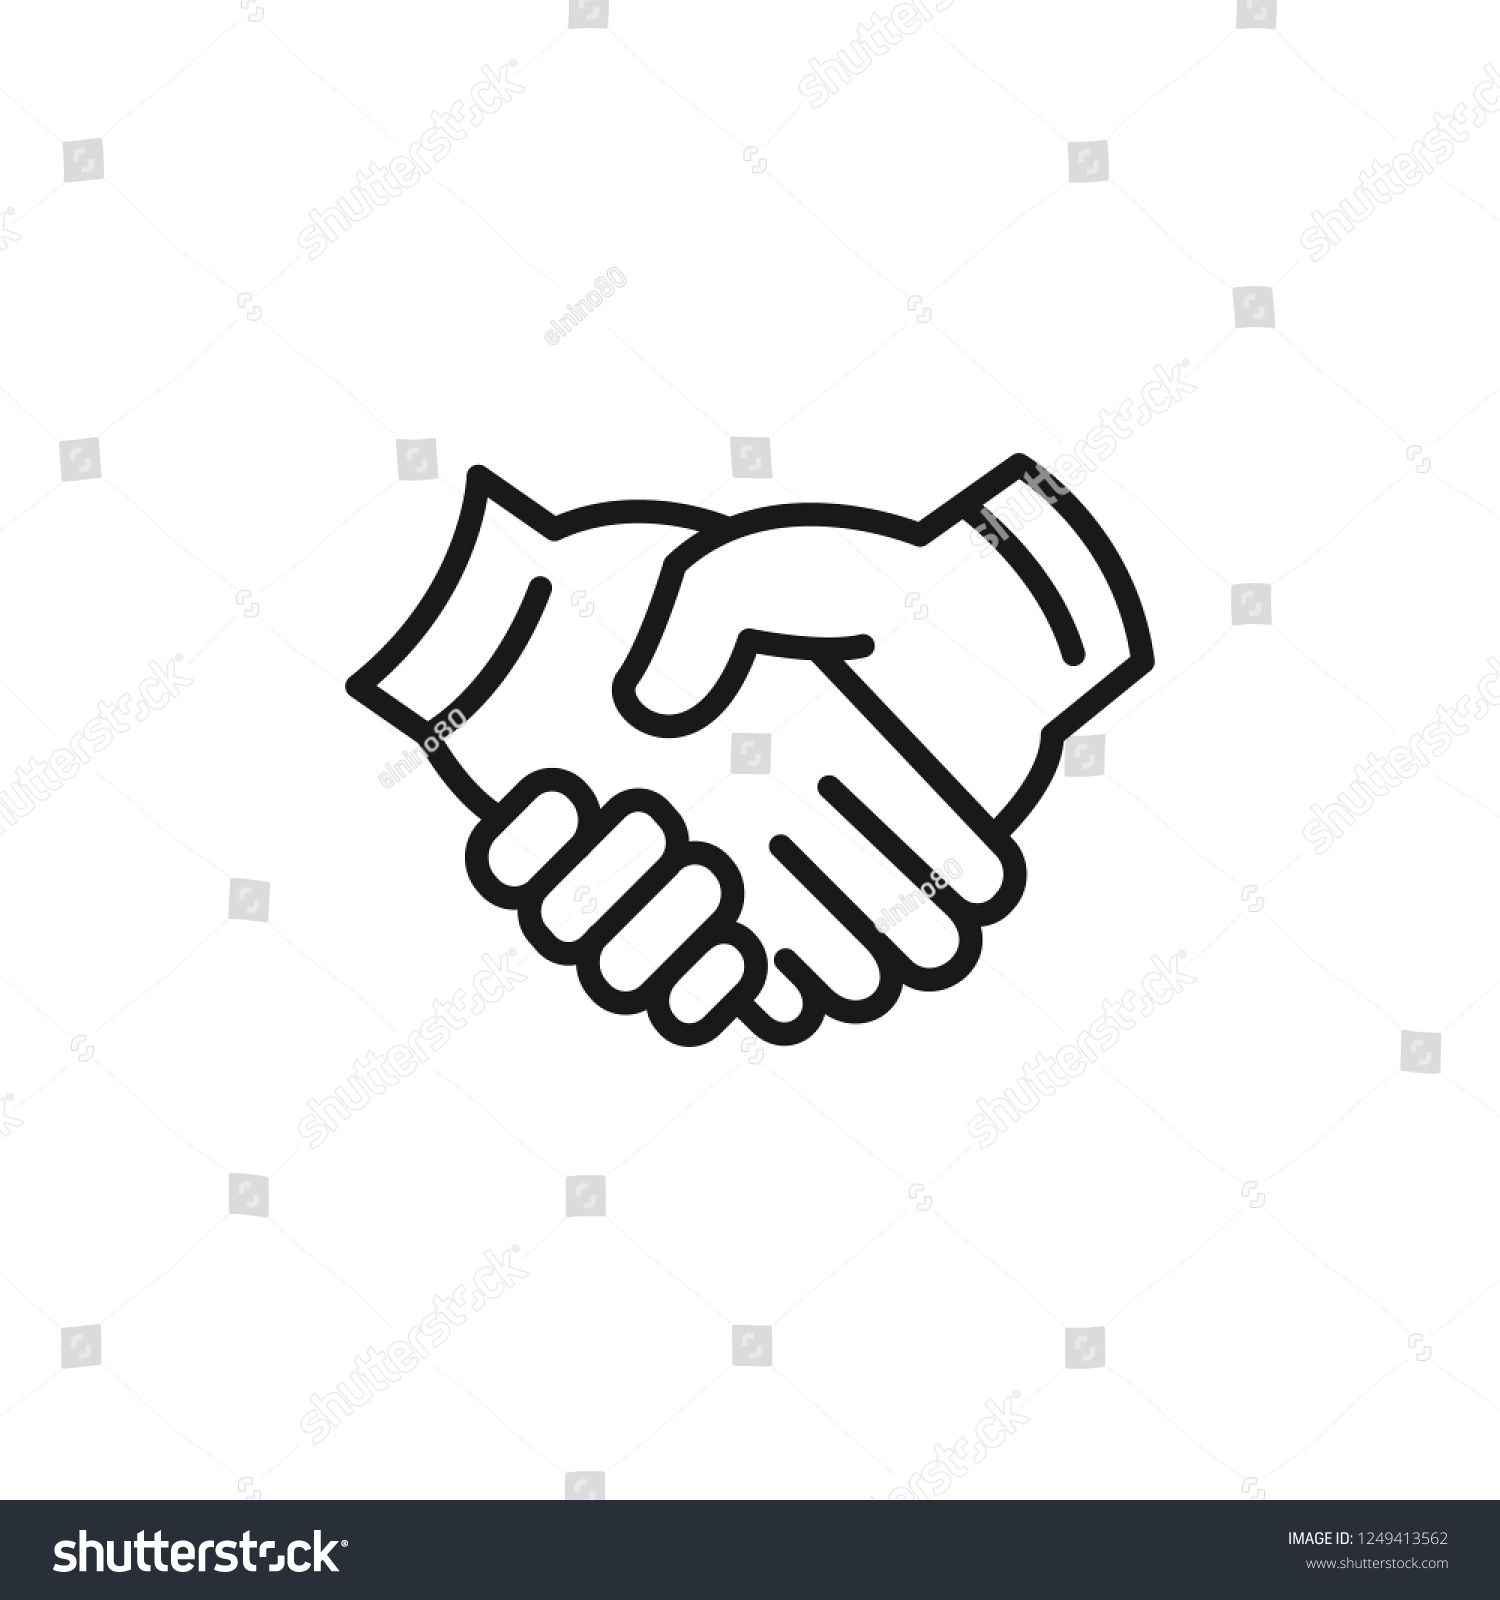 Agreement, hand, handshake icon  Editable vector 64x64 Pixel